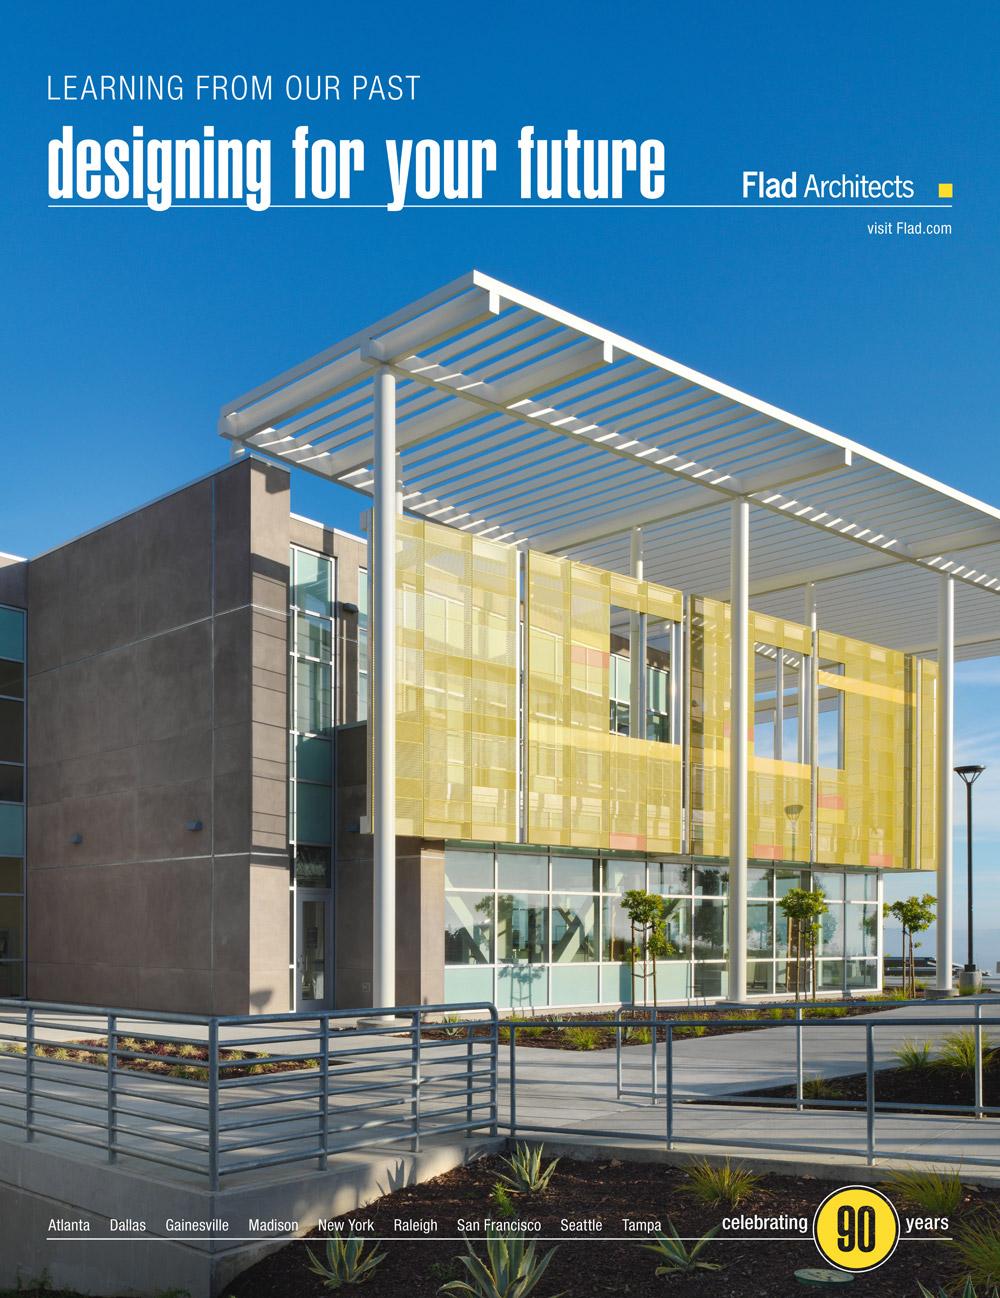 flad_architects_ad